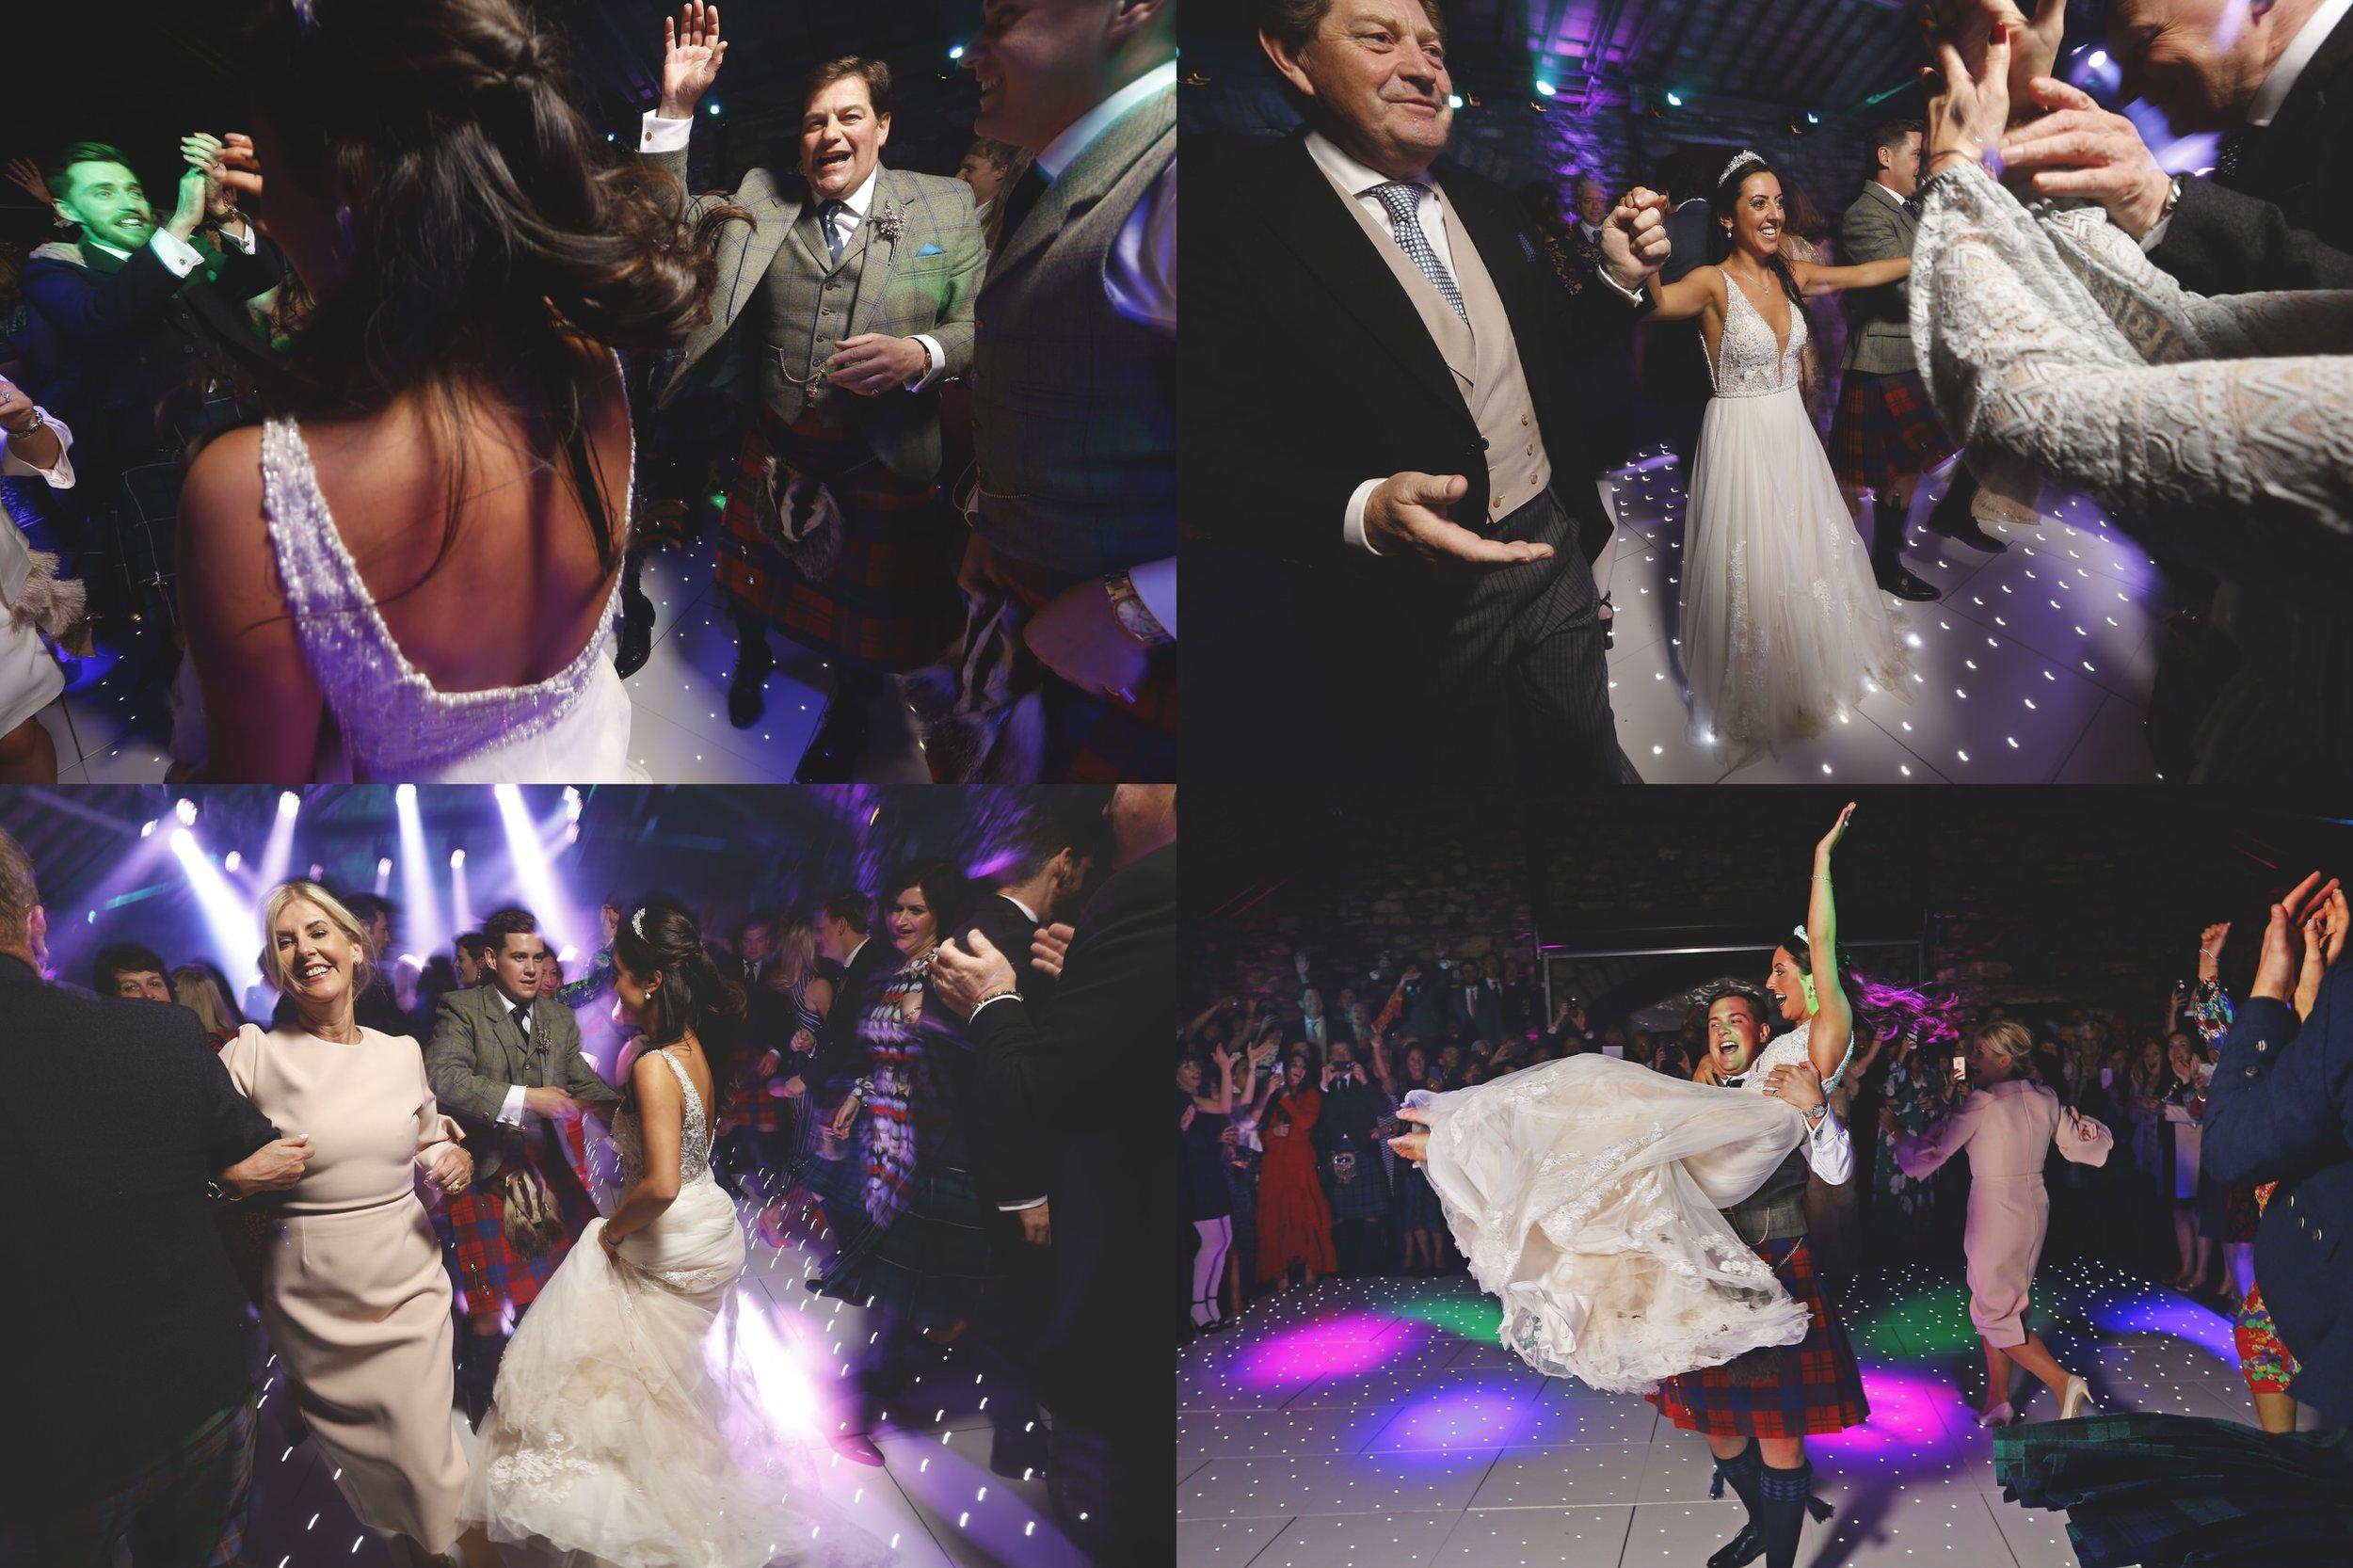 brett-harkness-cotland-wedding-photographer-highland-wedding_0035.jpg